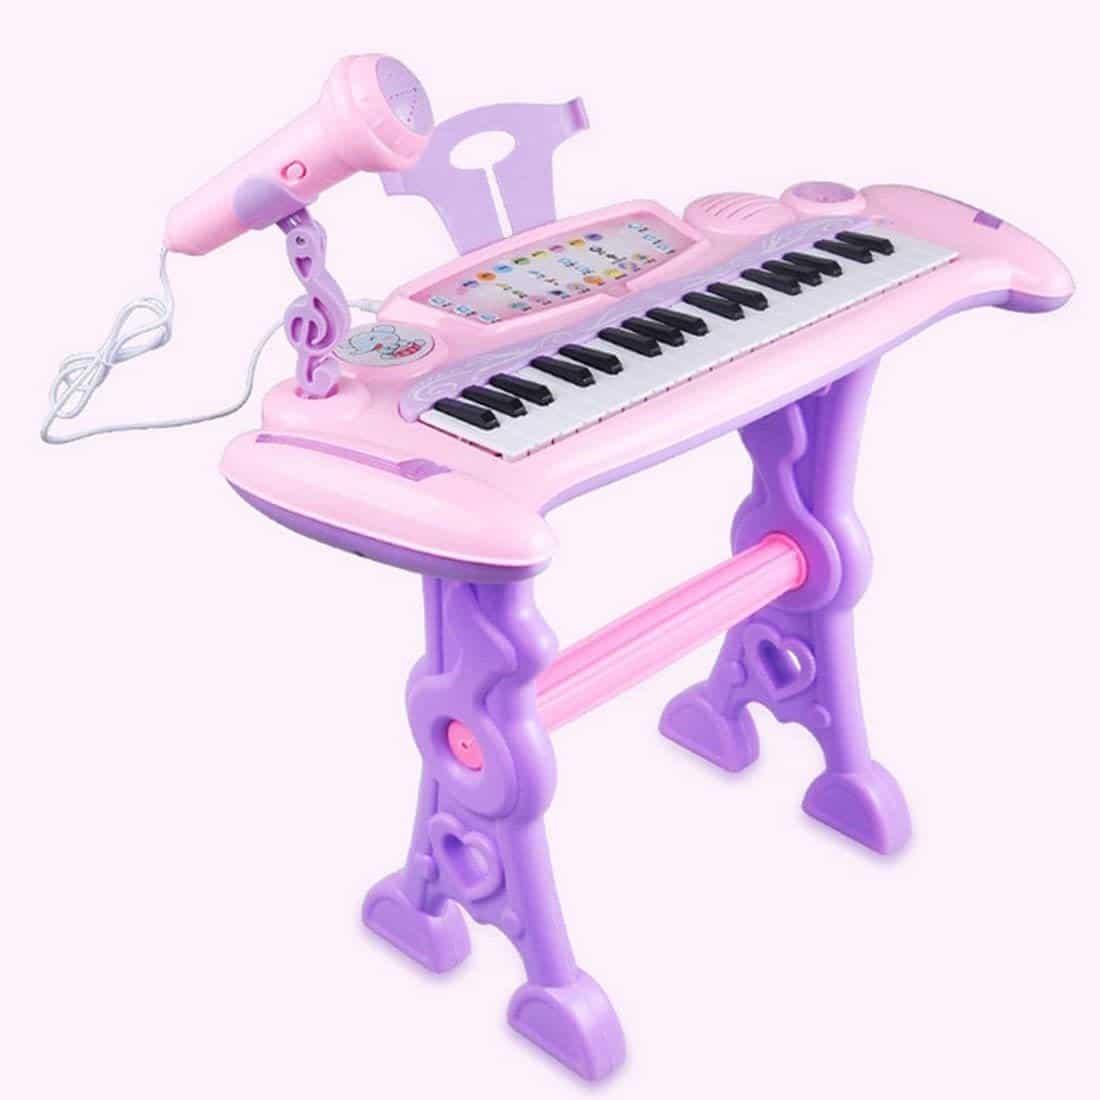 Children's Toy Piano